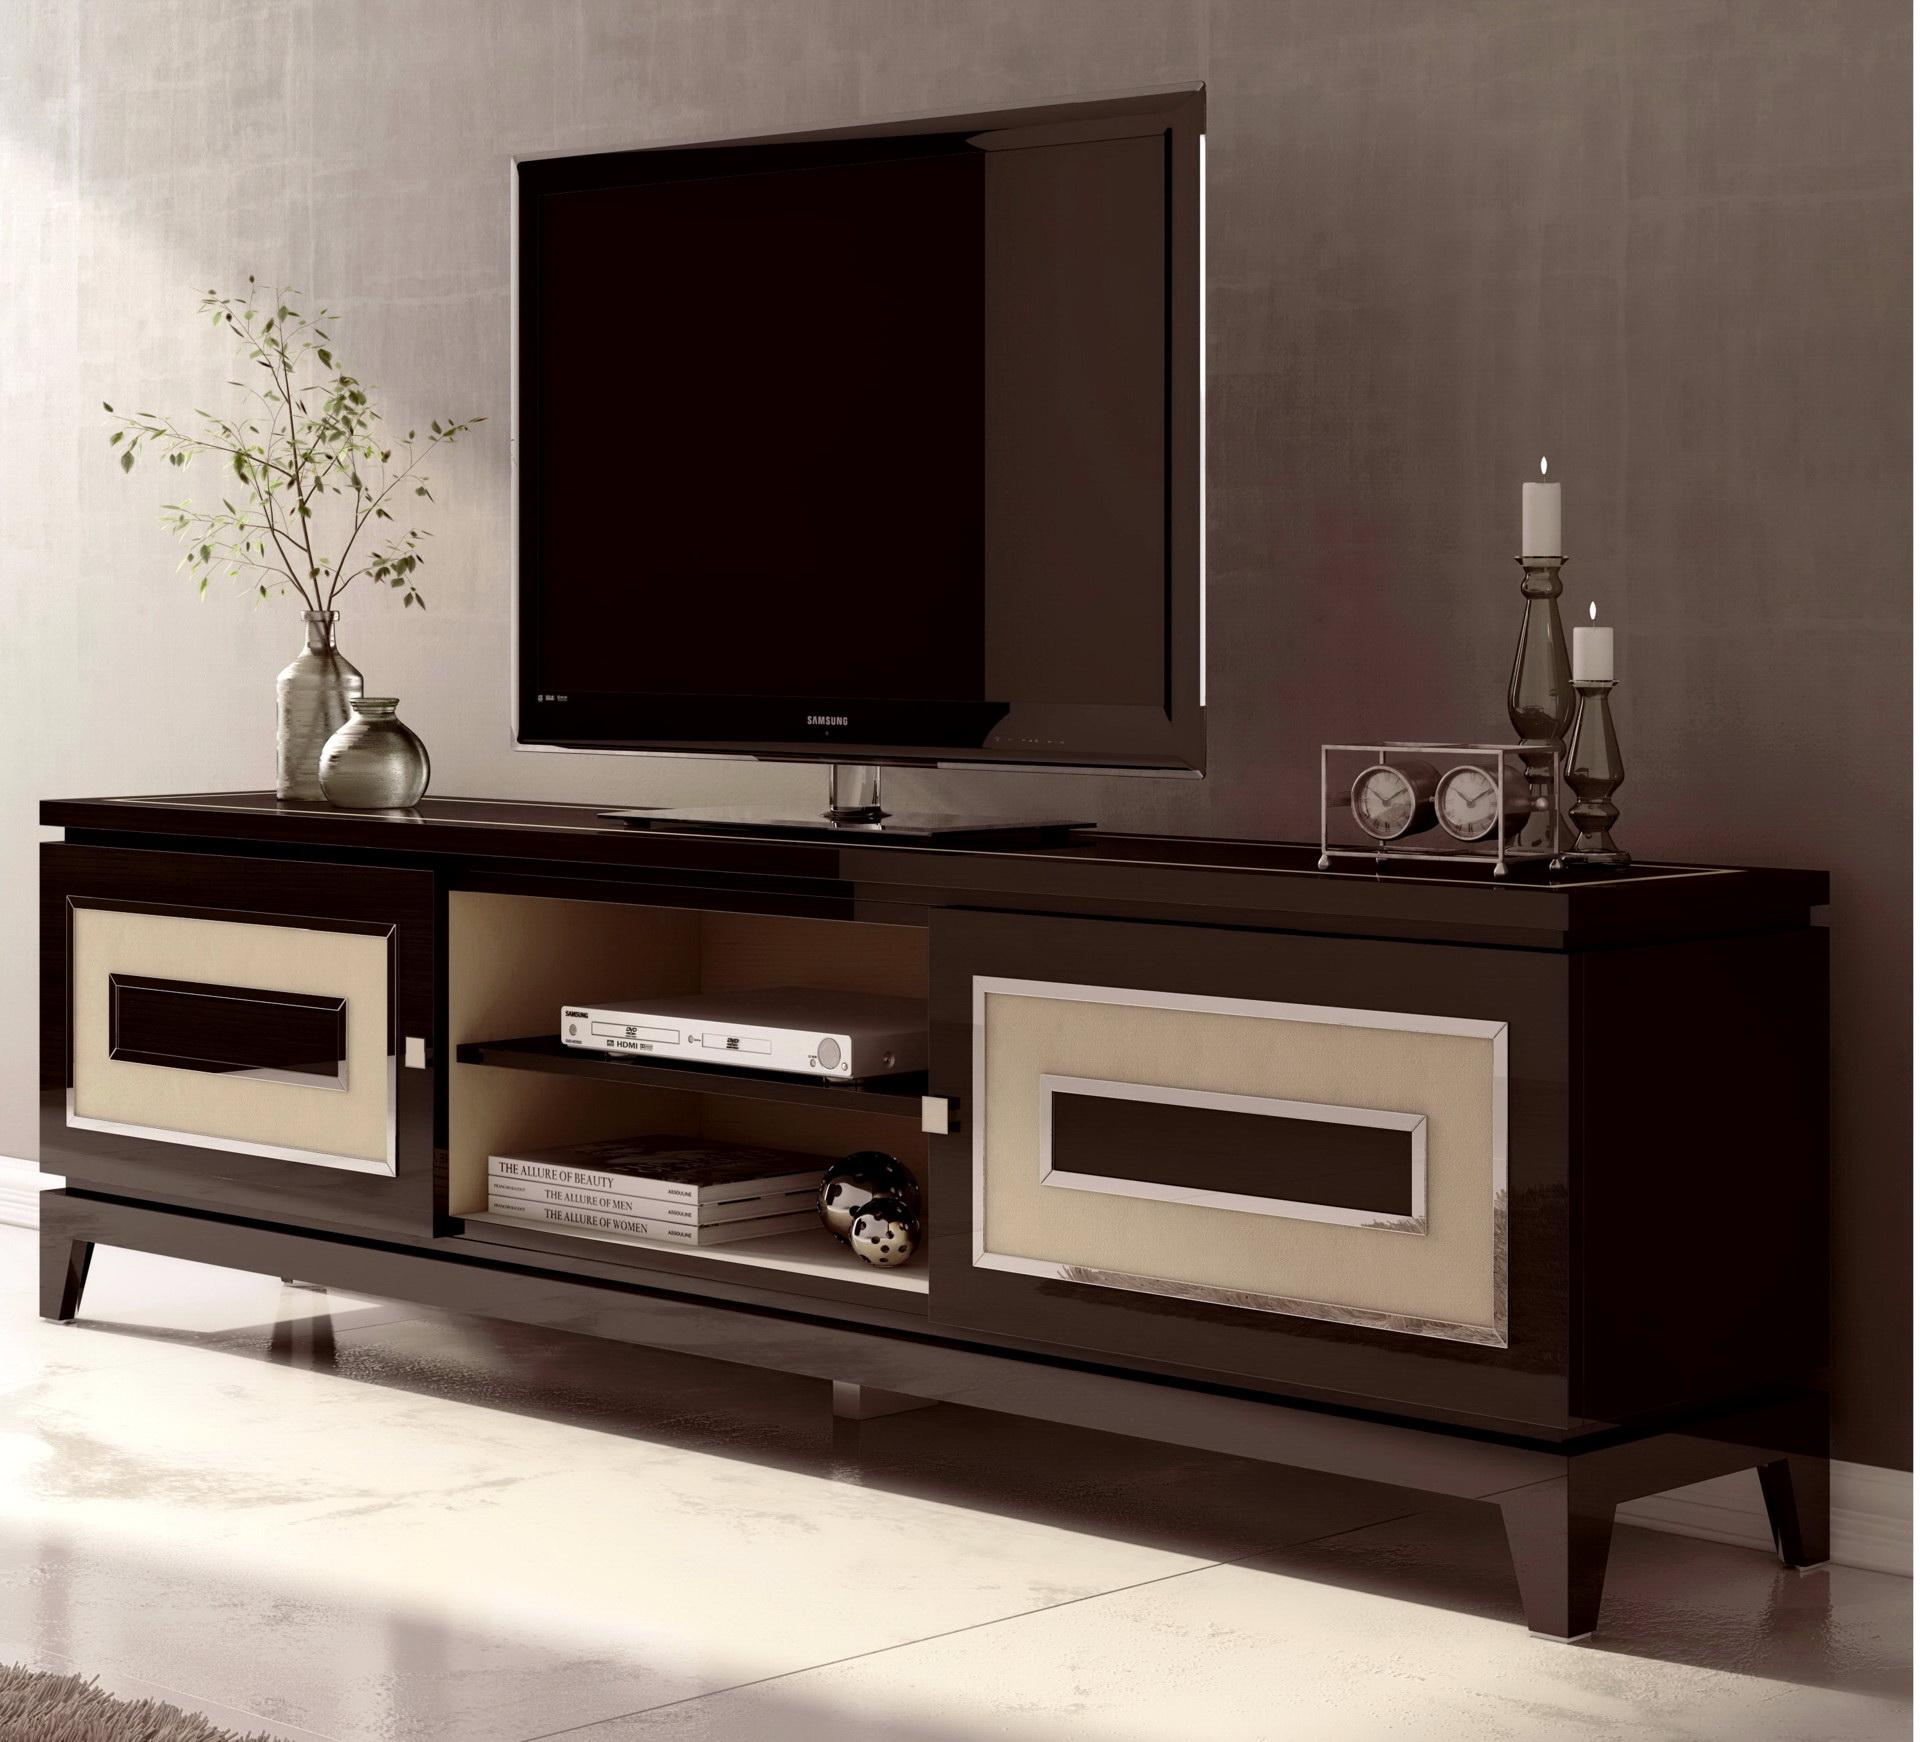 Mesas Tv Gama Alta By Mariner Muebles Anto N -> Muebles Para Tv Modernos 2017